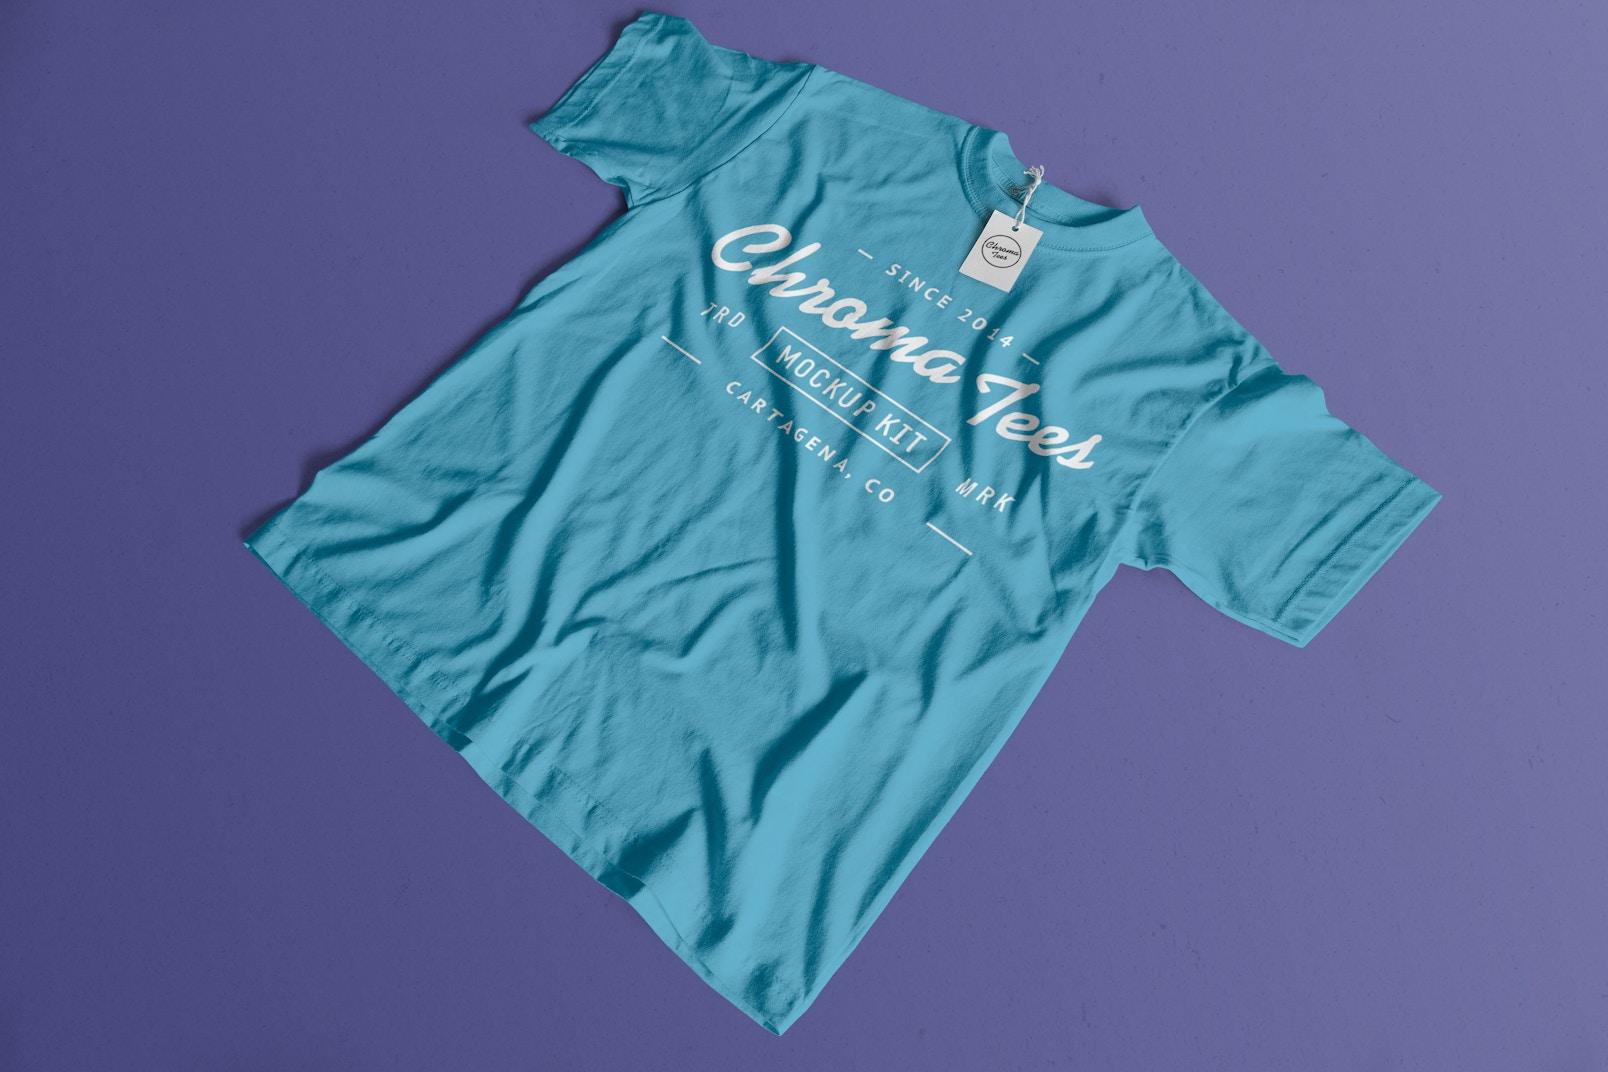 T-Shirt Mockup 02